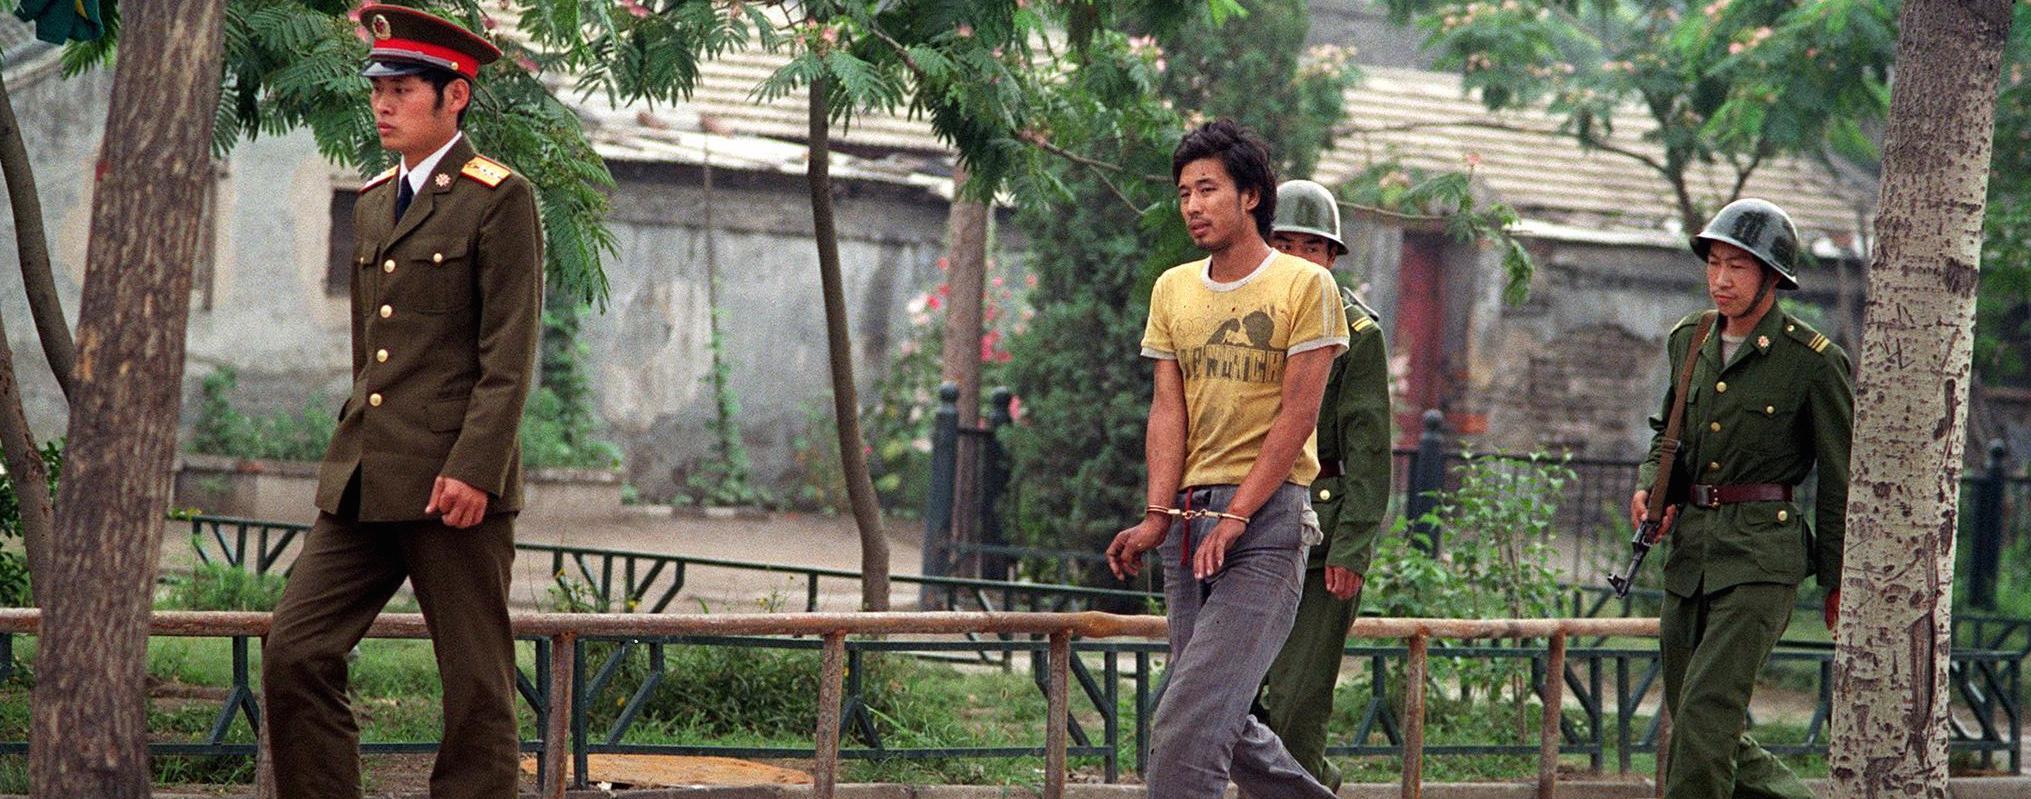 Un ragazzo arrestato in piazza Tienanmen